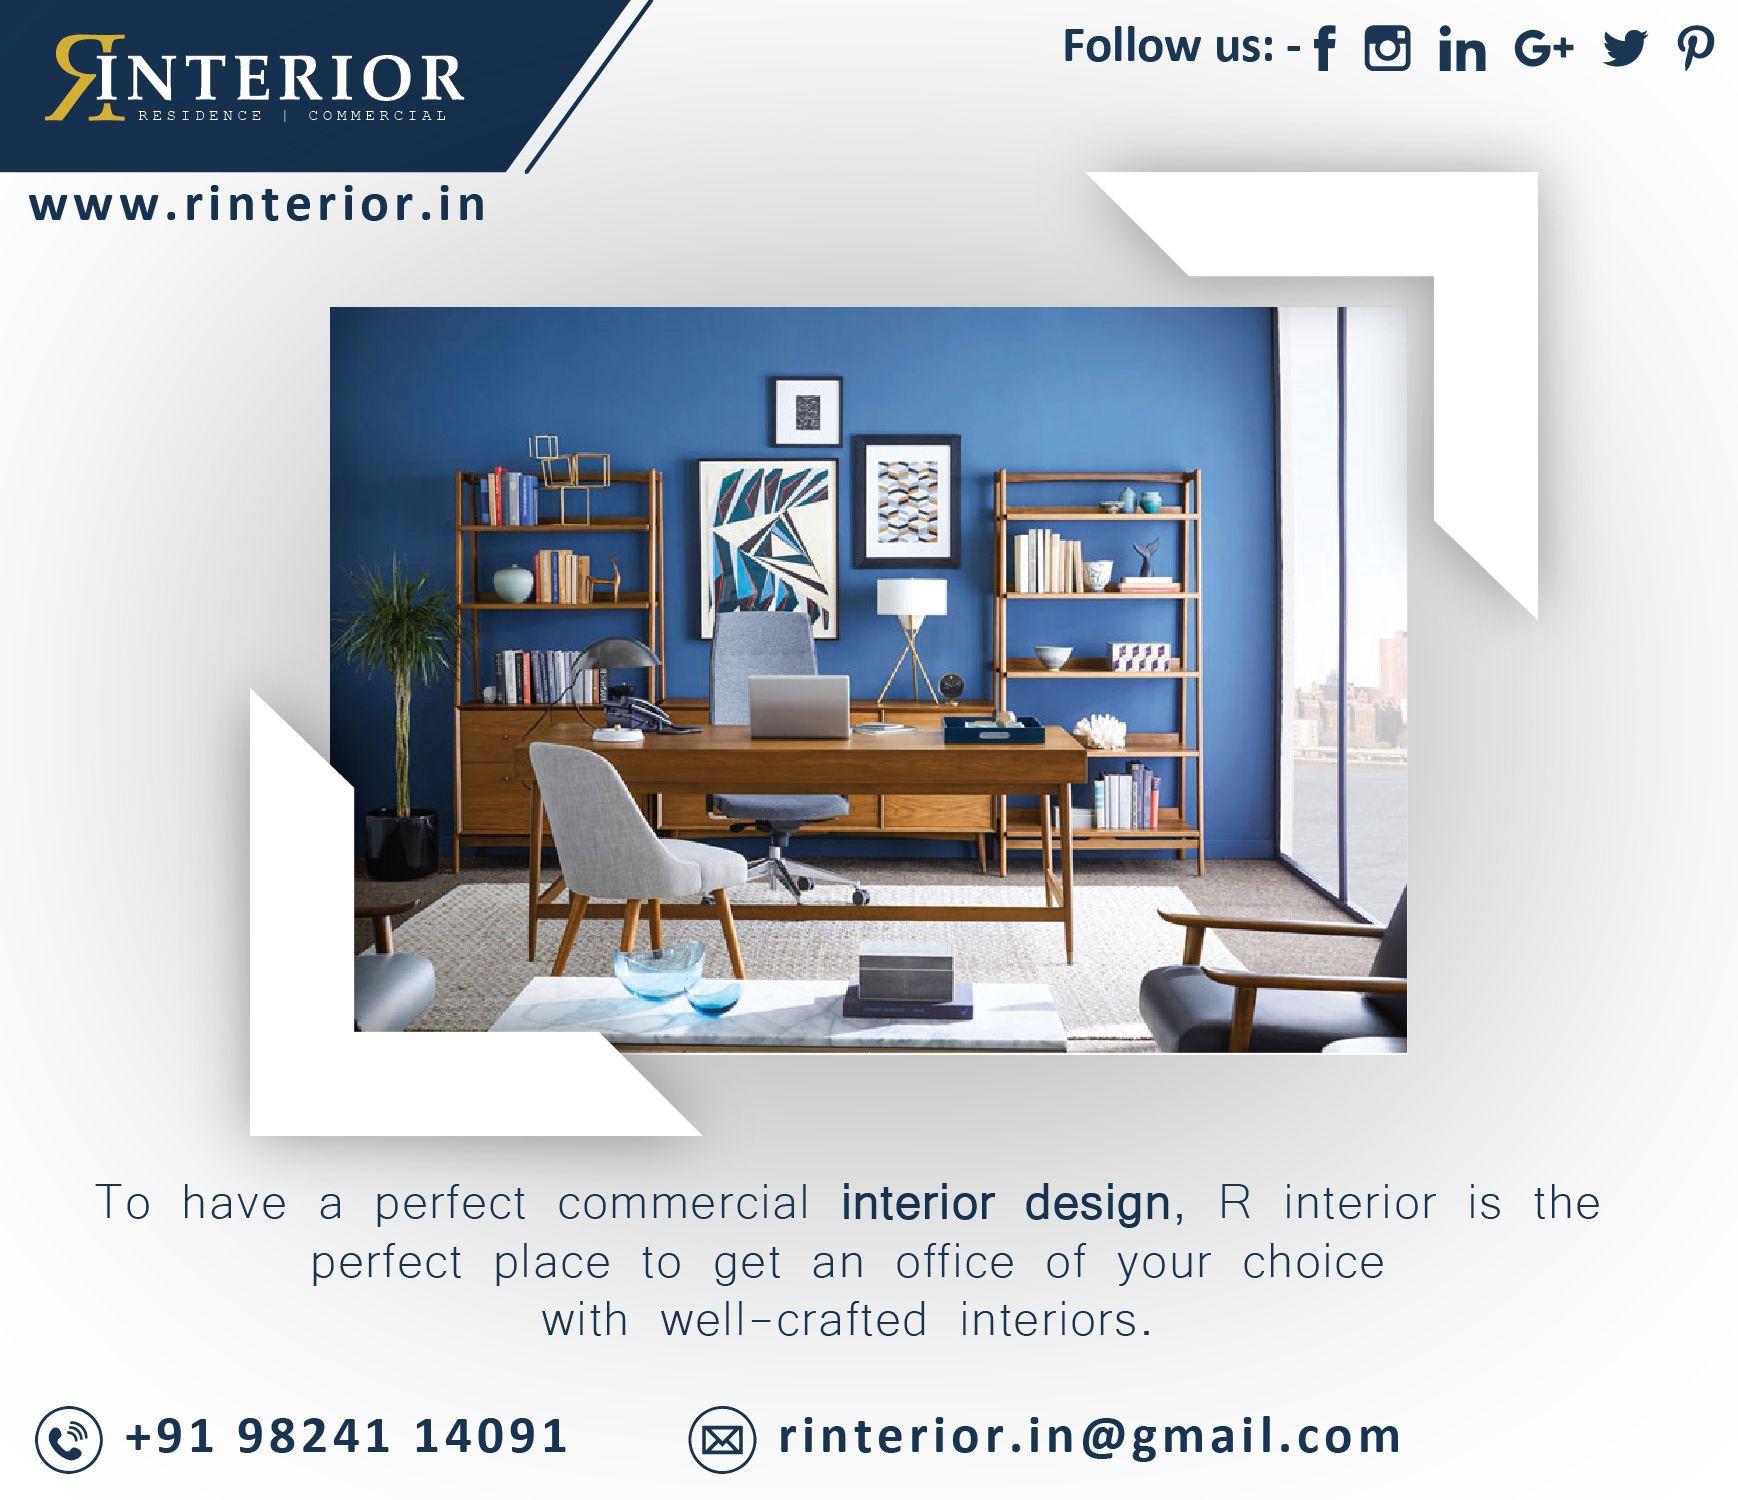 Home Officeinterior Design Ideas: To Have A Perfect Commercial Interior Design , R Interior